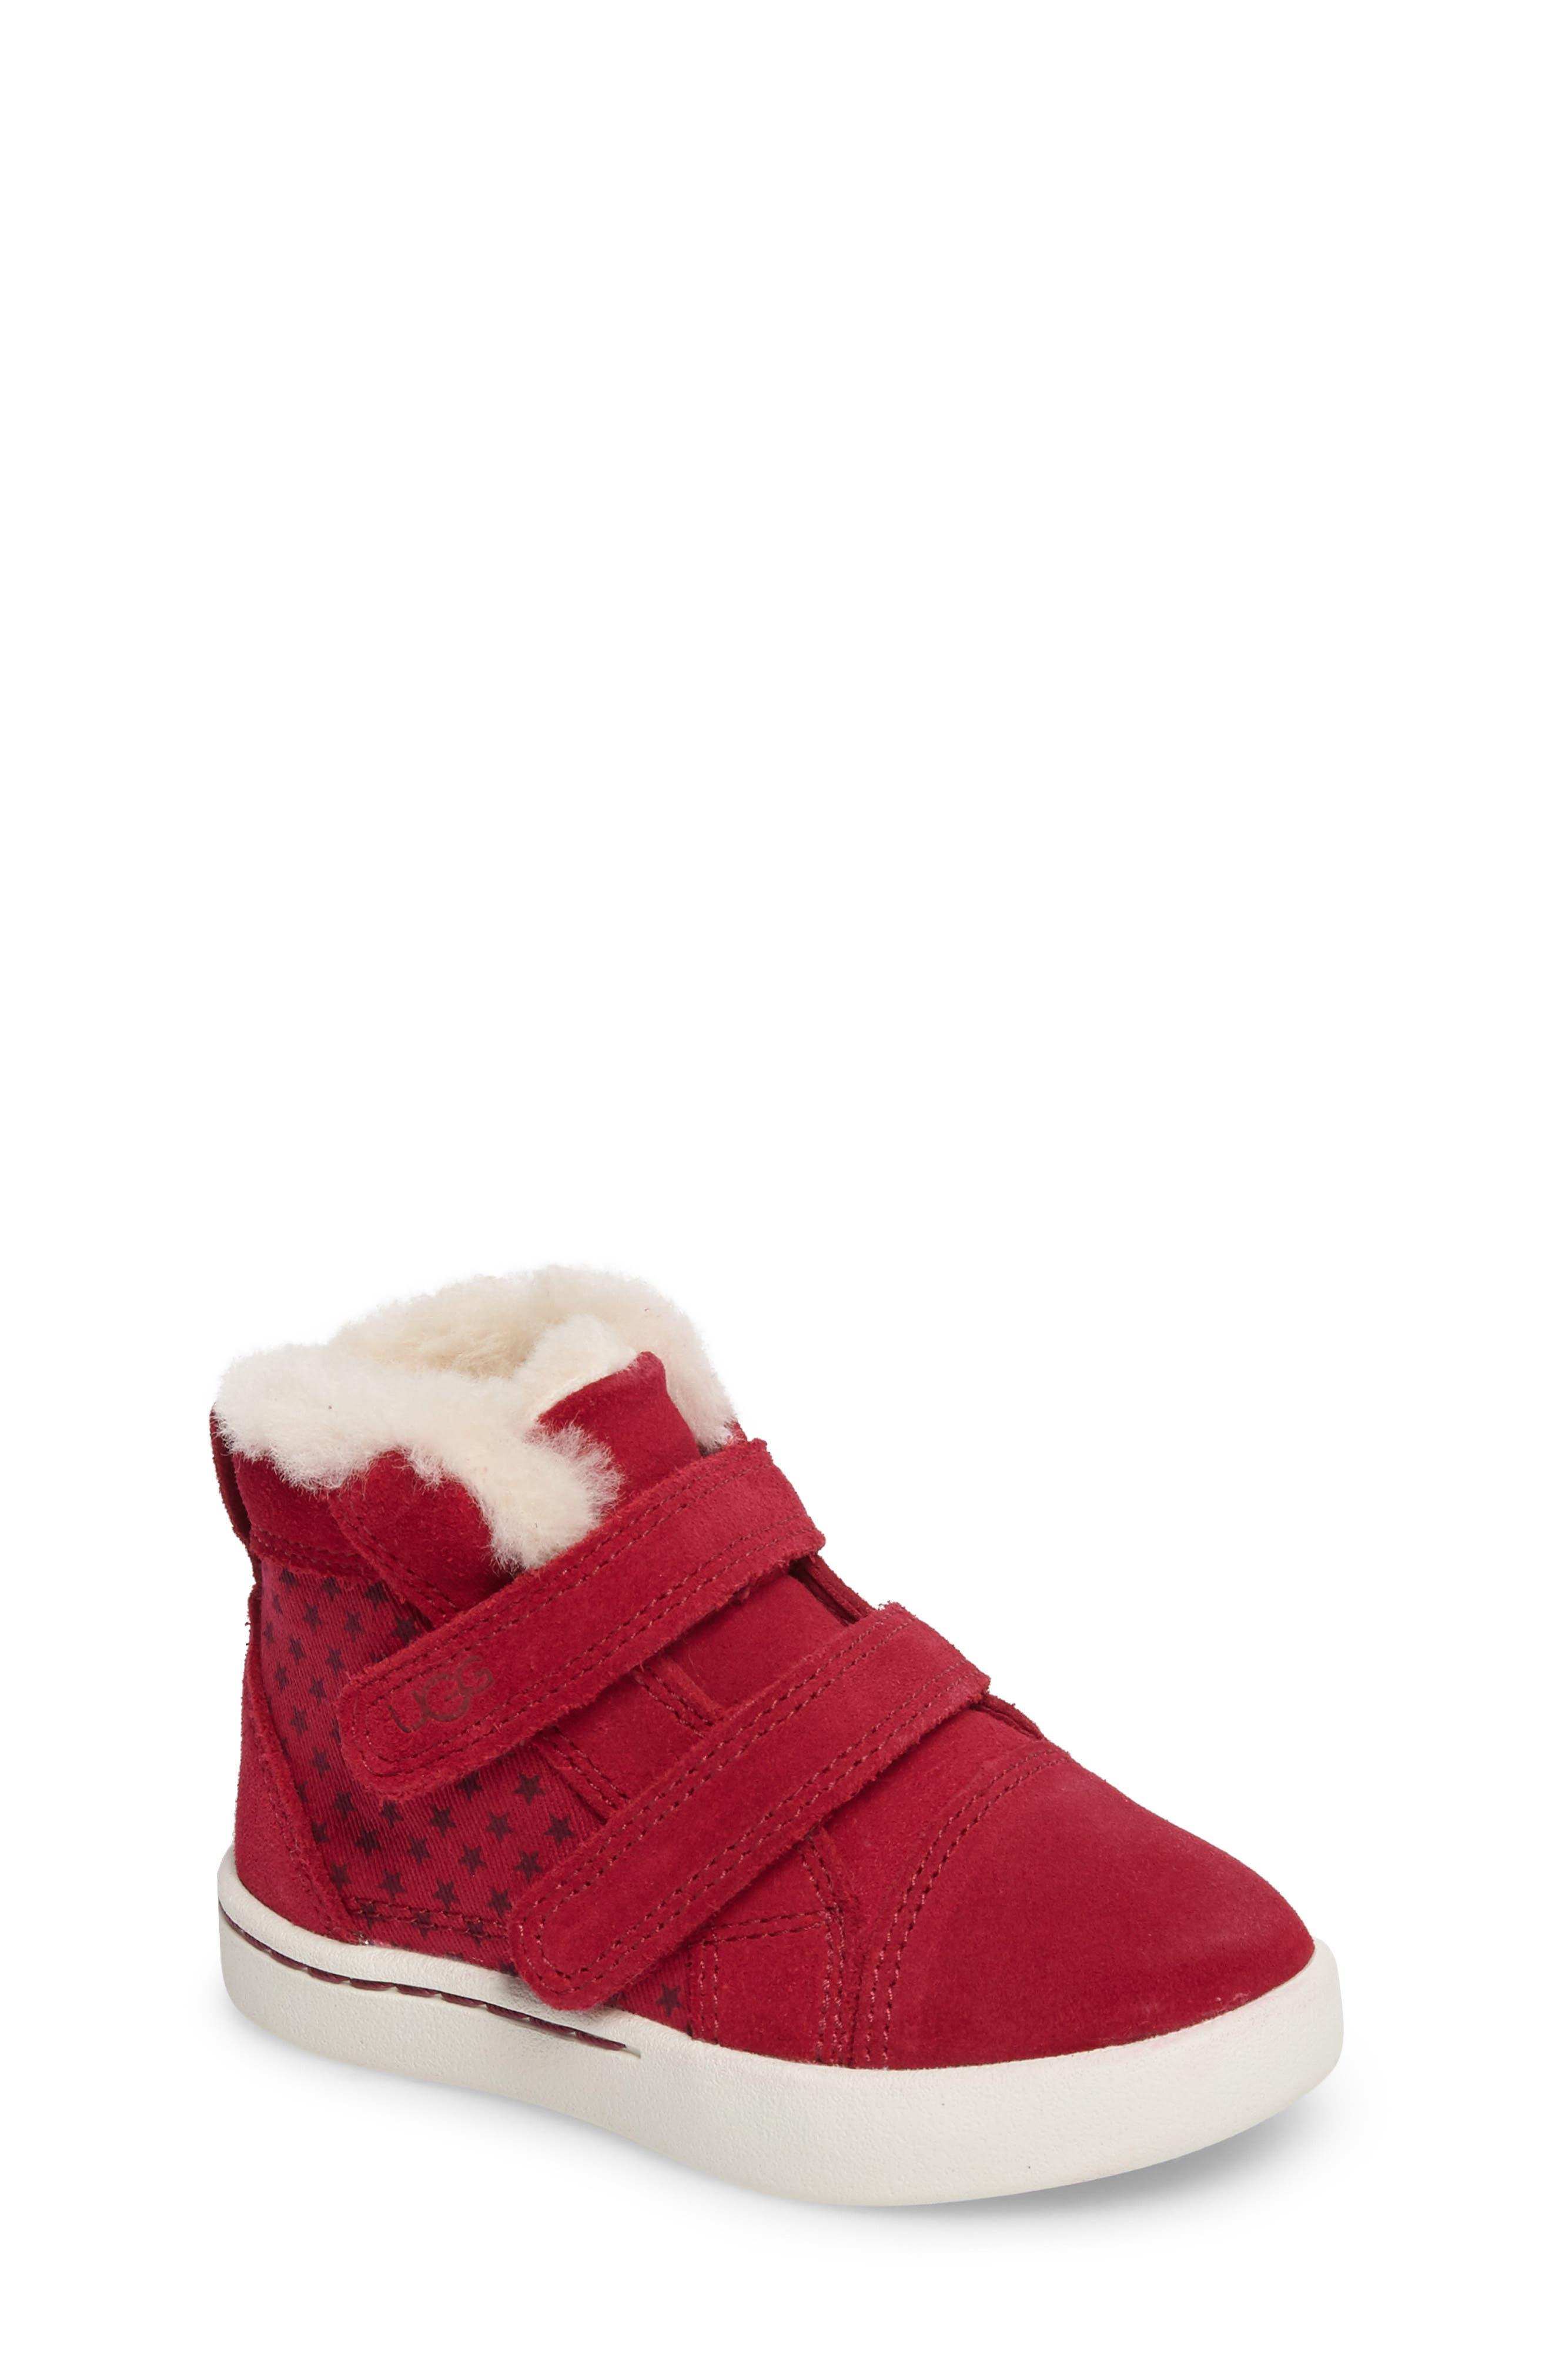 Rennon Stars High Top Sneaker,                         Main,                         color, 650